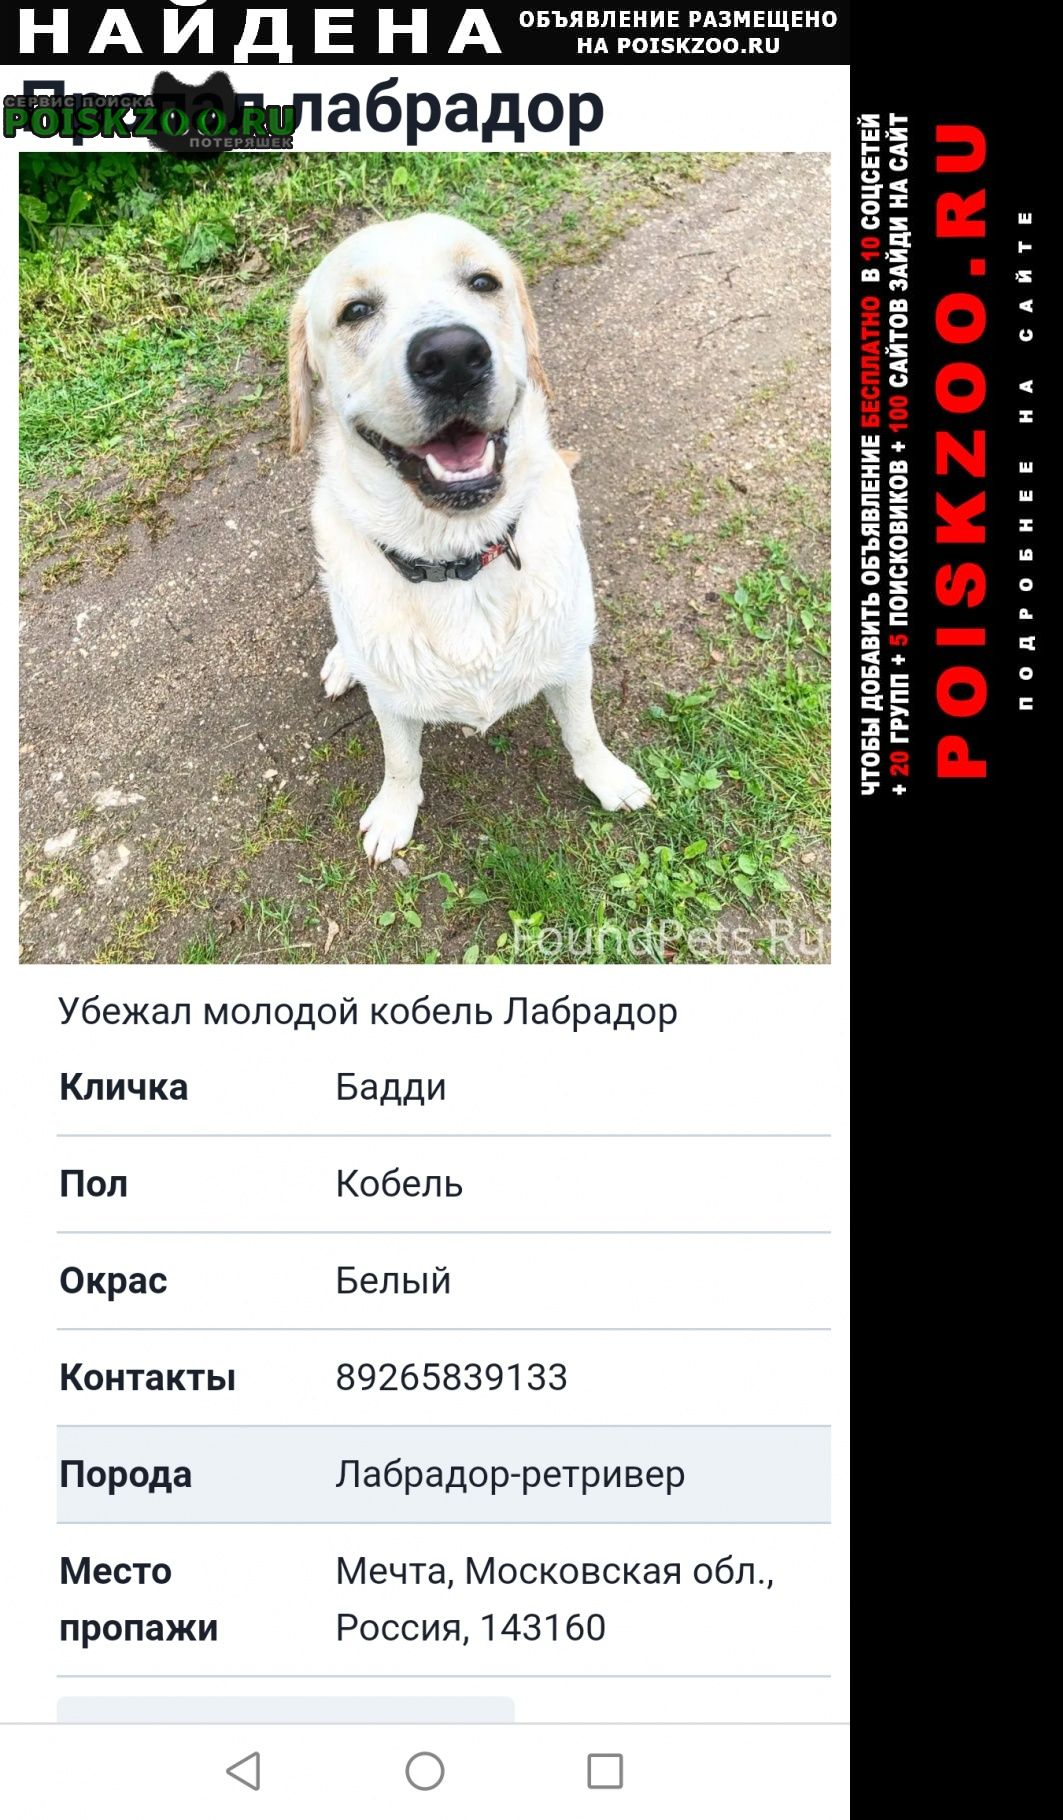 Найдена собака кобель Можайск